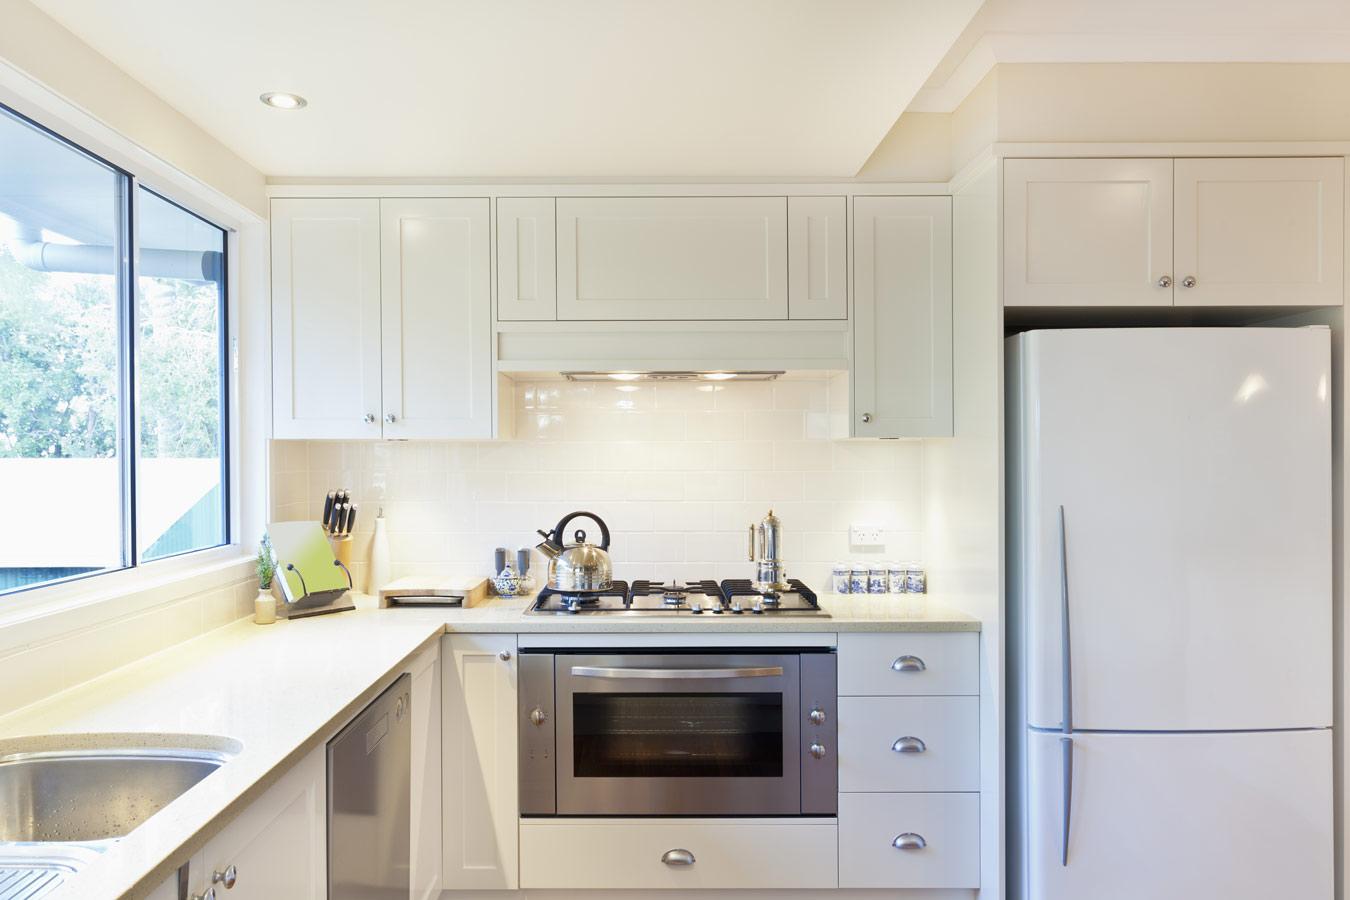 Keukenkasten schilderen stappenplan en kleuren - Kleur verf moderne keuken ...